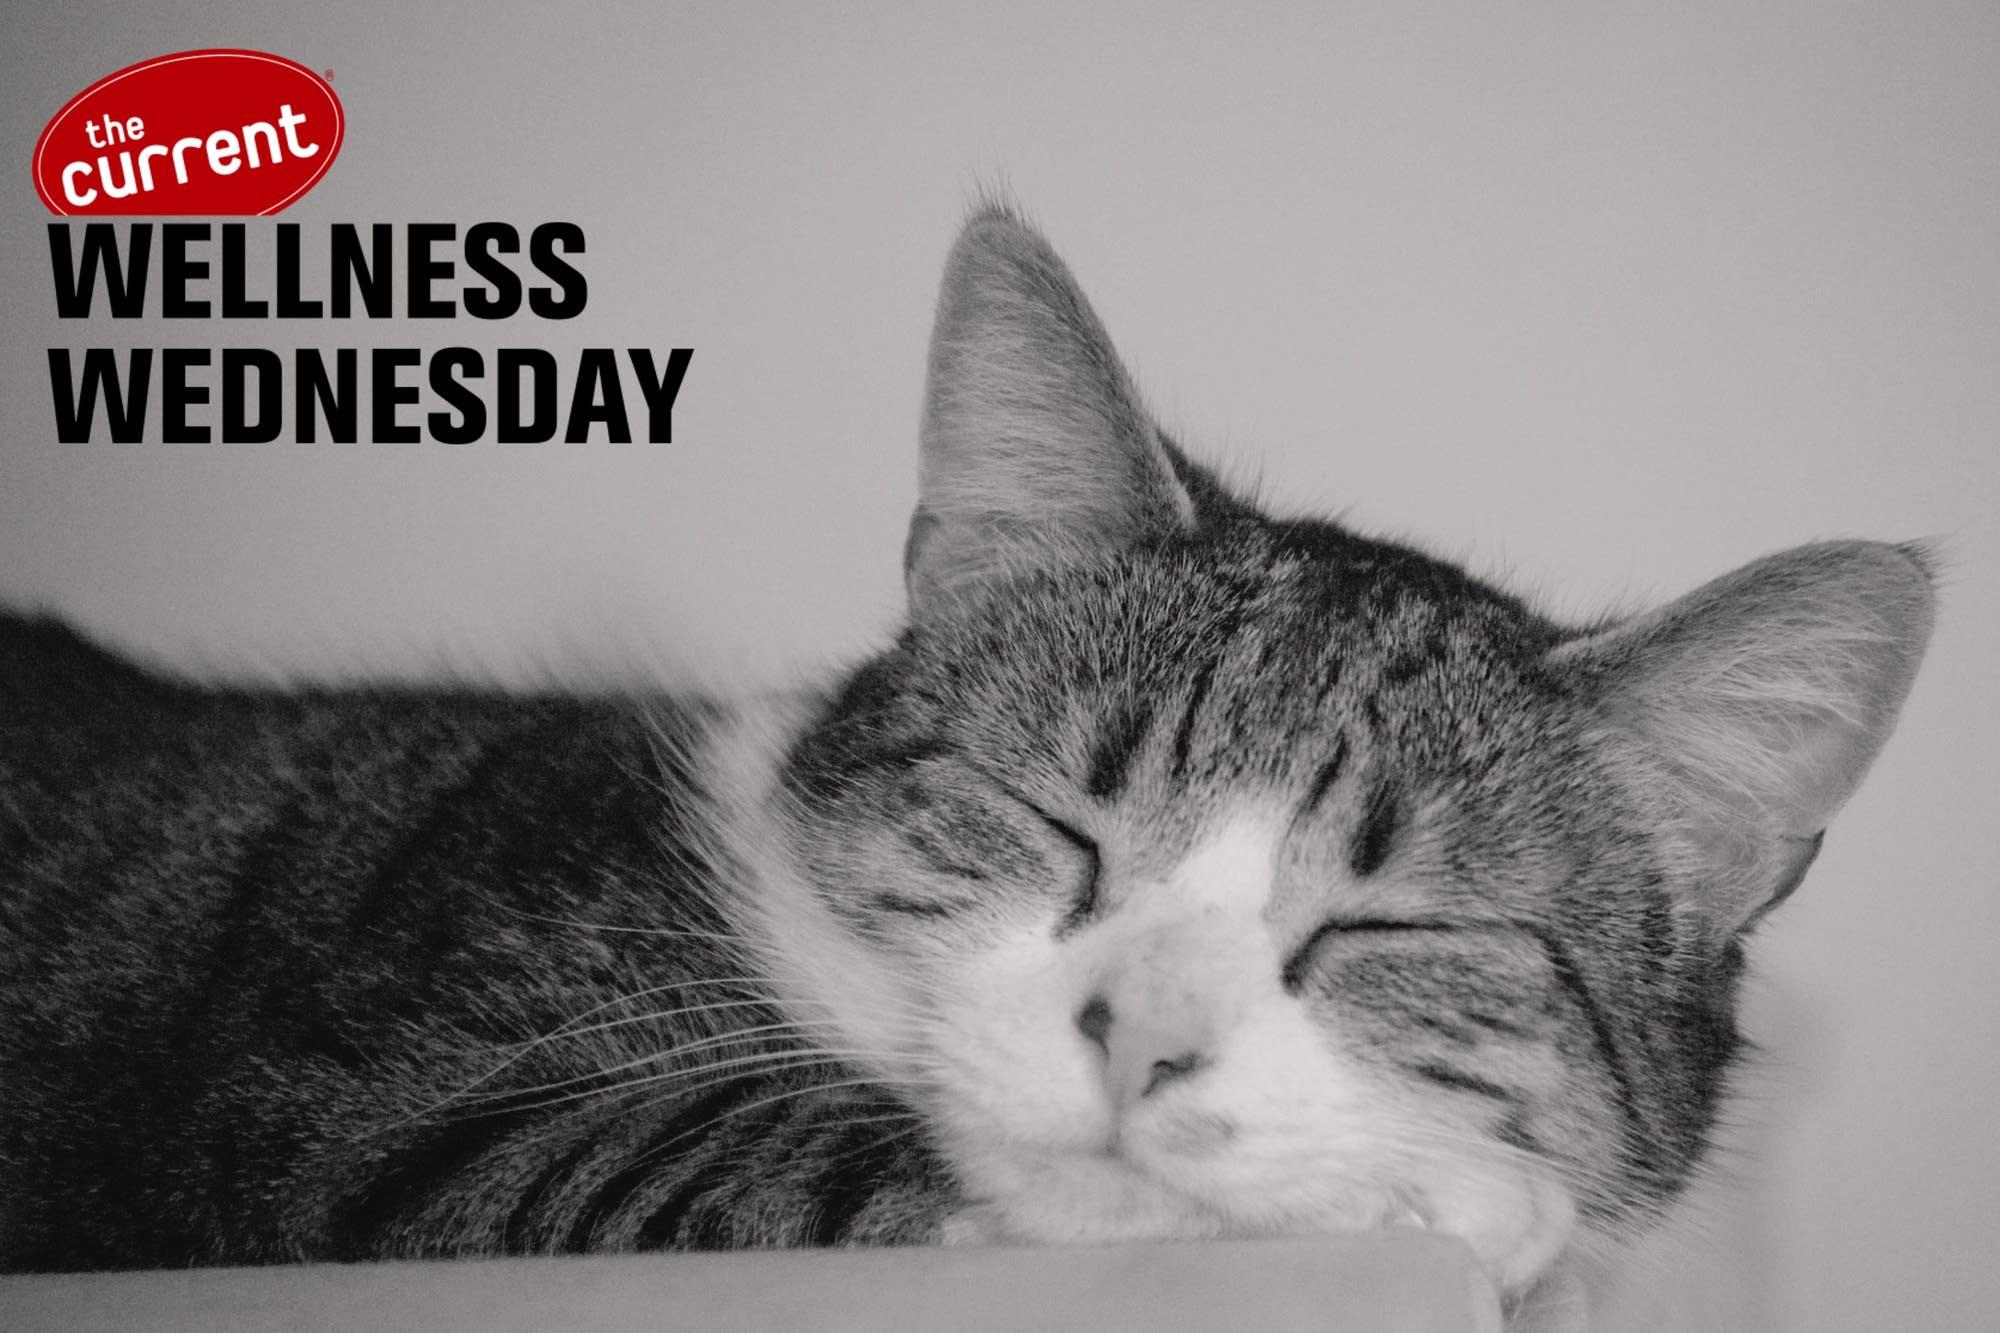 Sleeping cat with Wellness Wednesday logo.